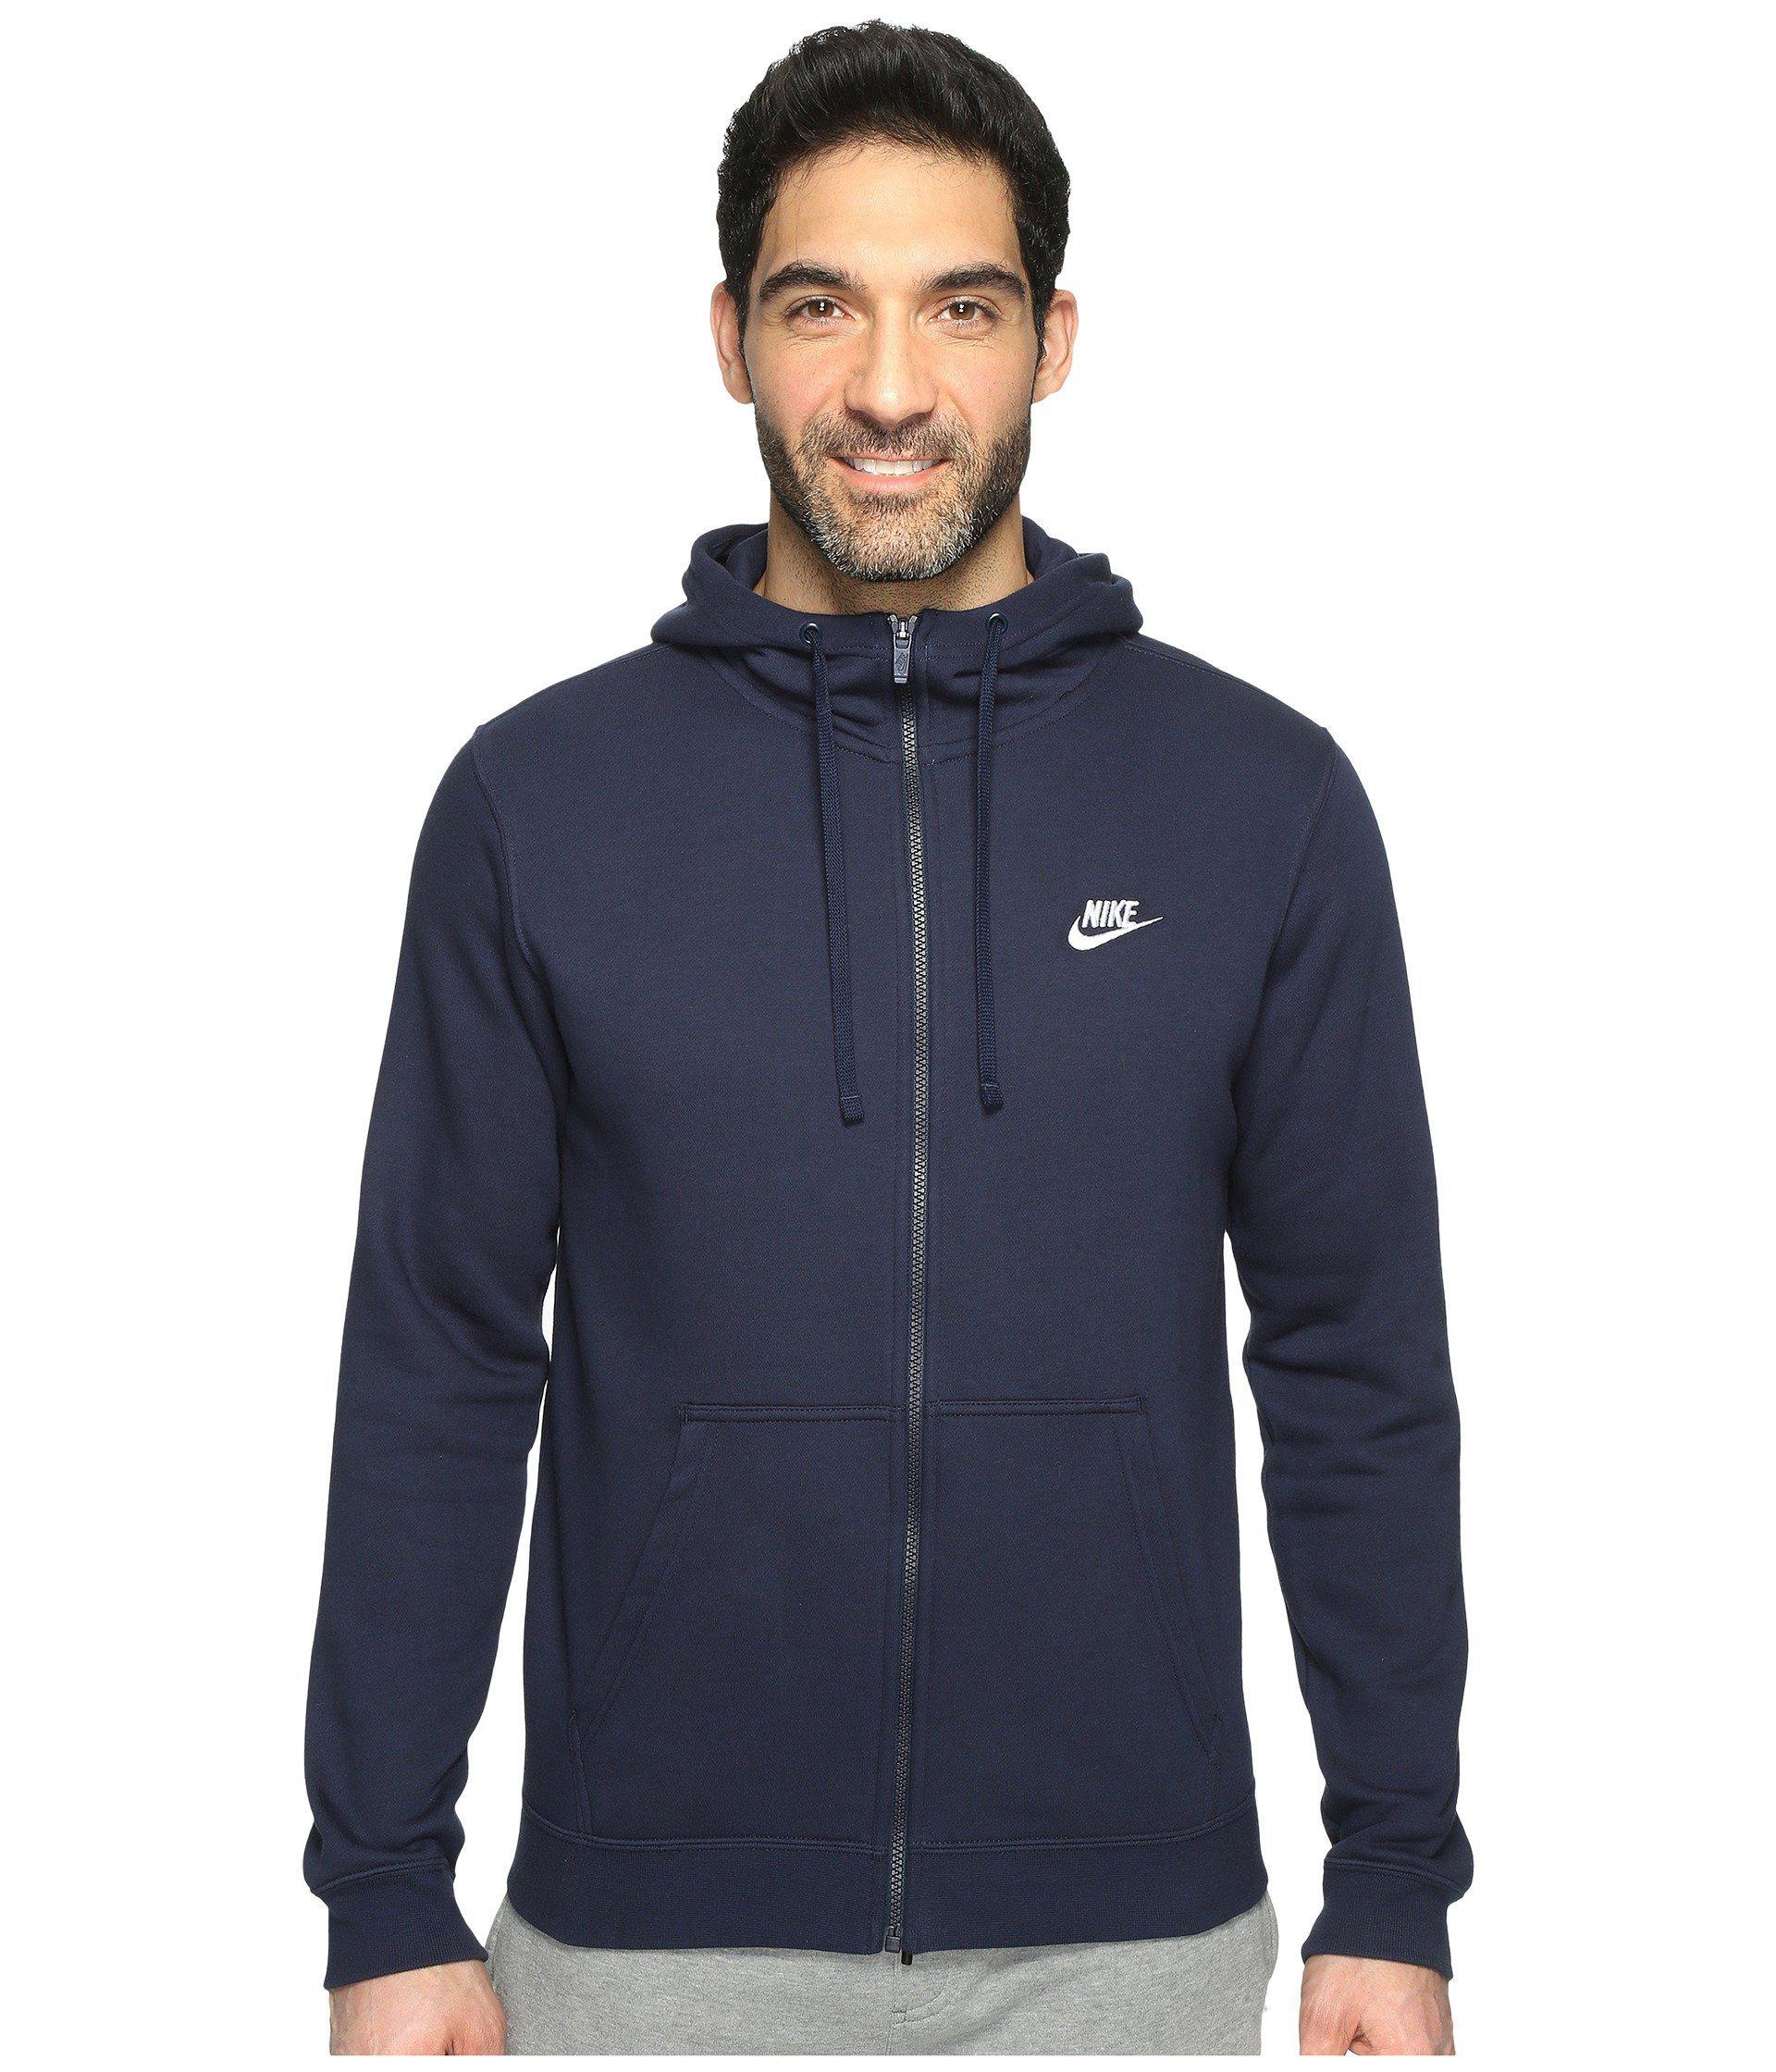 f7d5540f7c Lyst - Nike Club Fleece Full-zip Hoodie (black black white) Men s ...